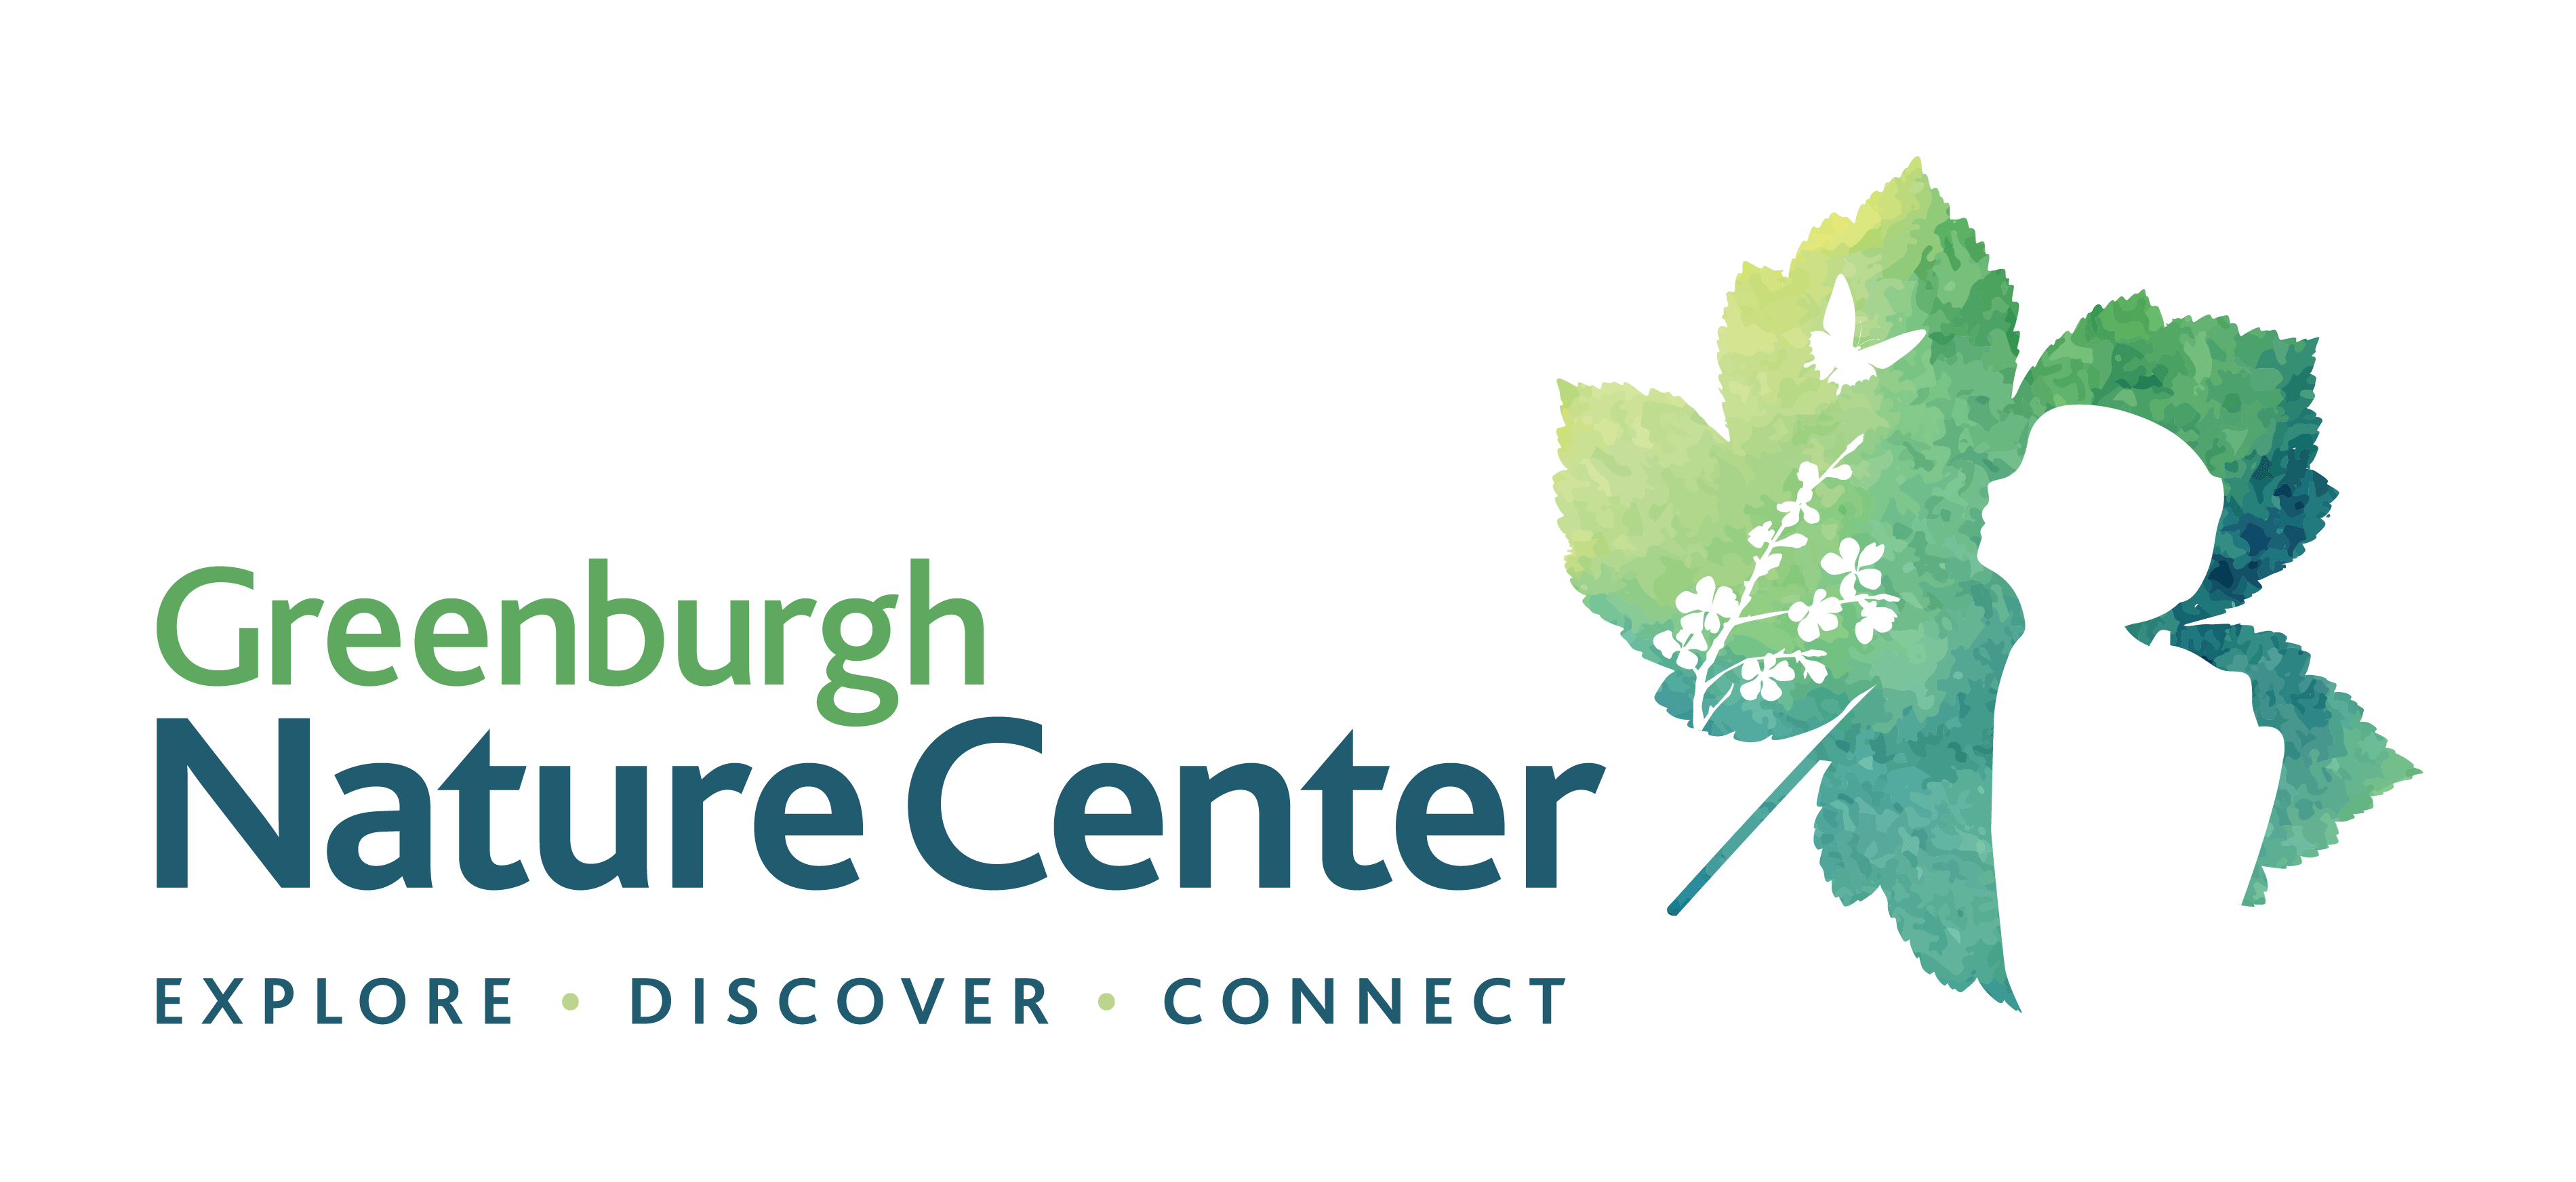 Greenburgh Nature Center